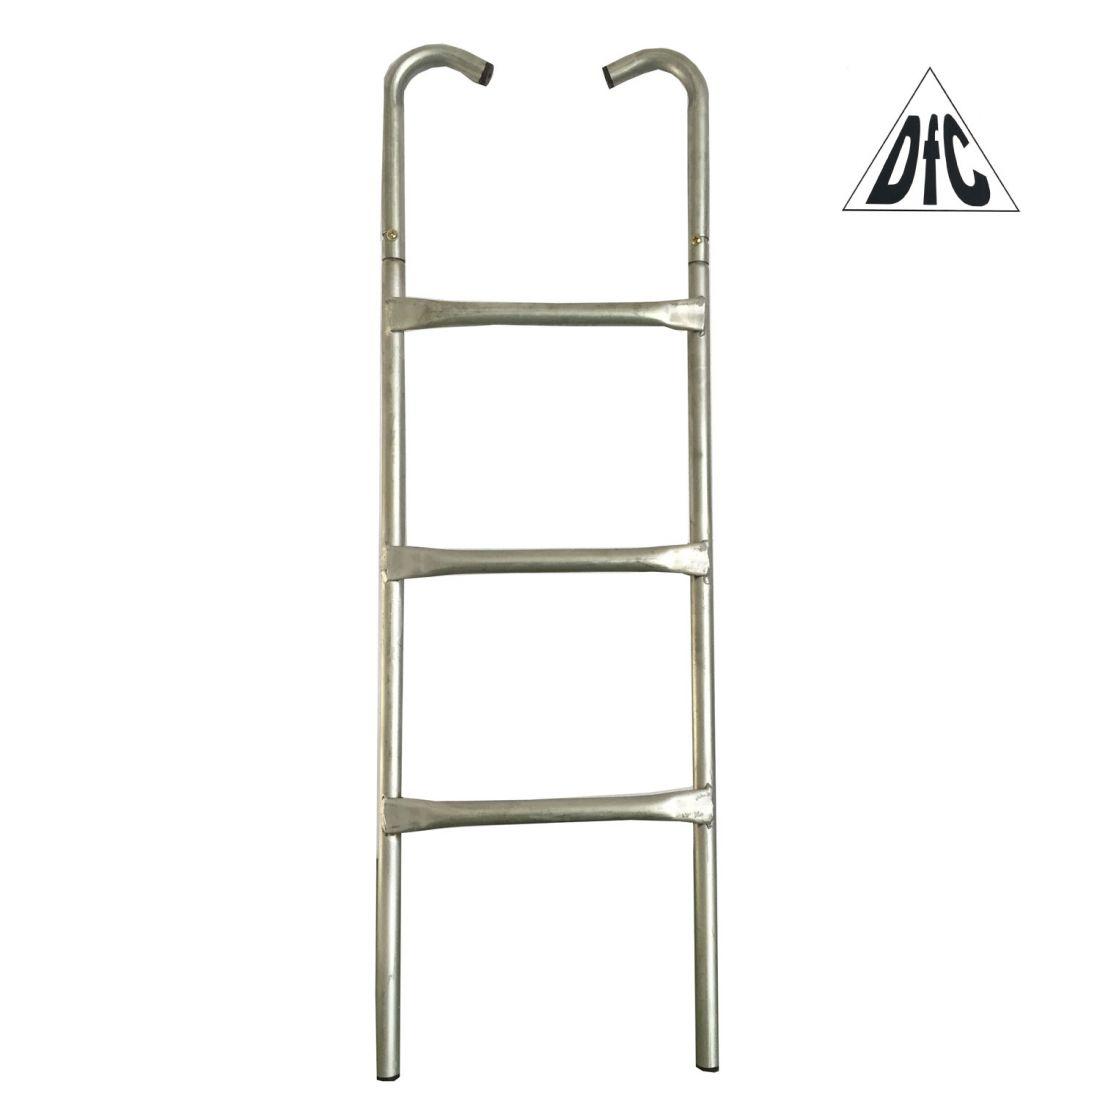 Лестница для батута 12-16 футов - DFC 3ST-L